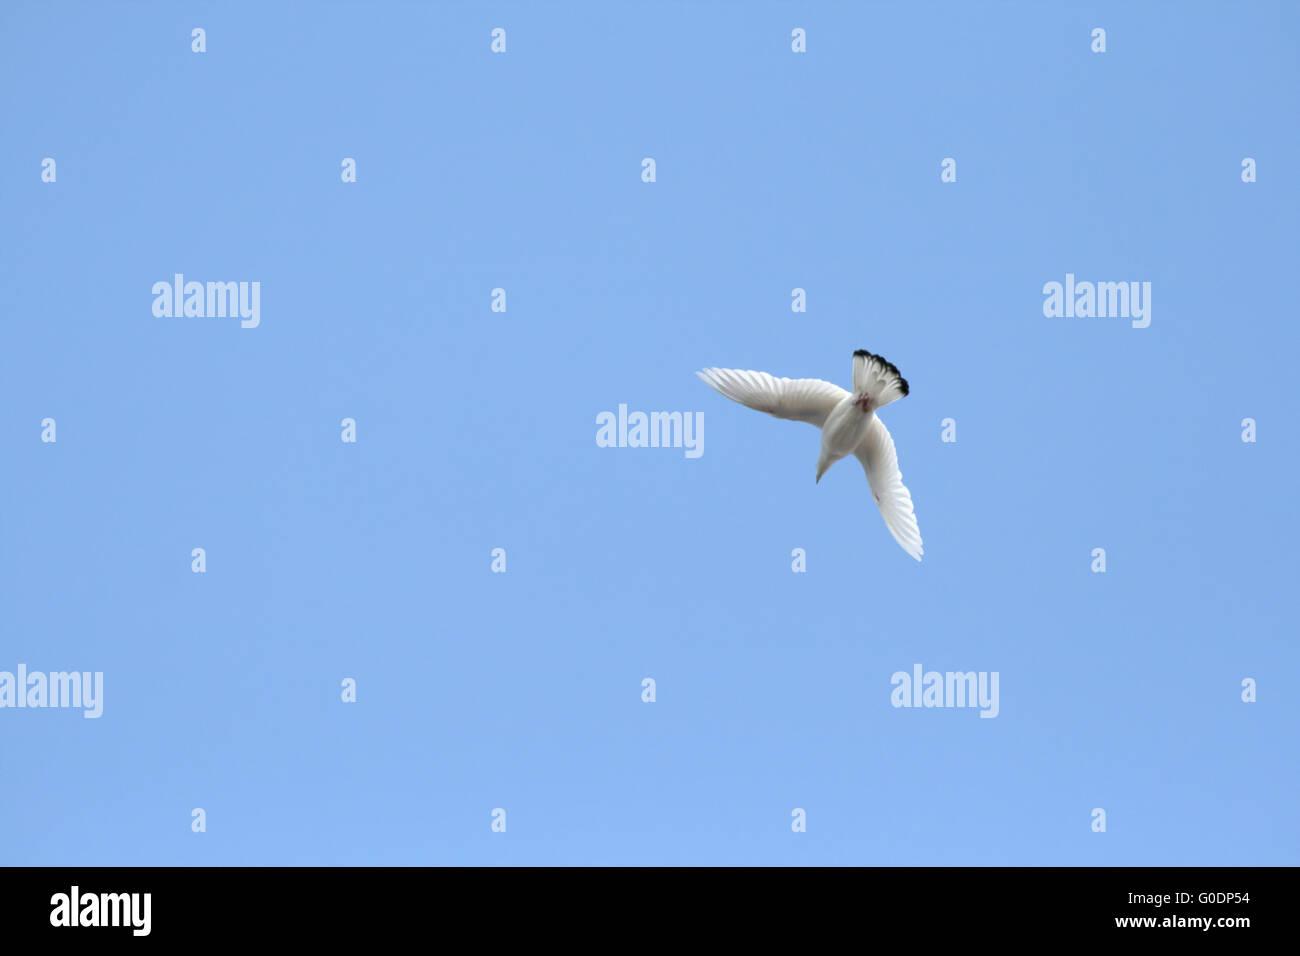 White Dove Flying - Stock Image